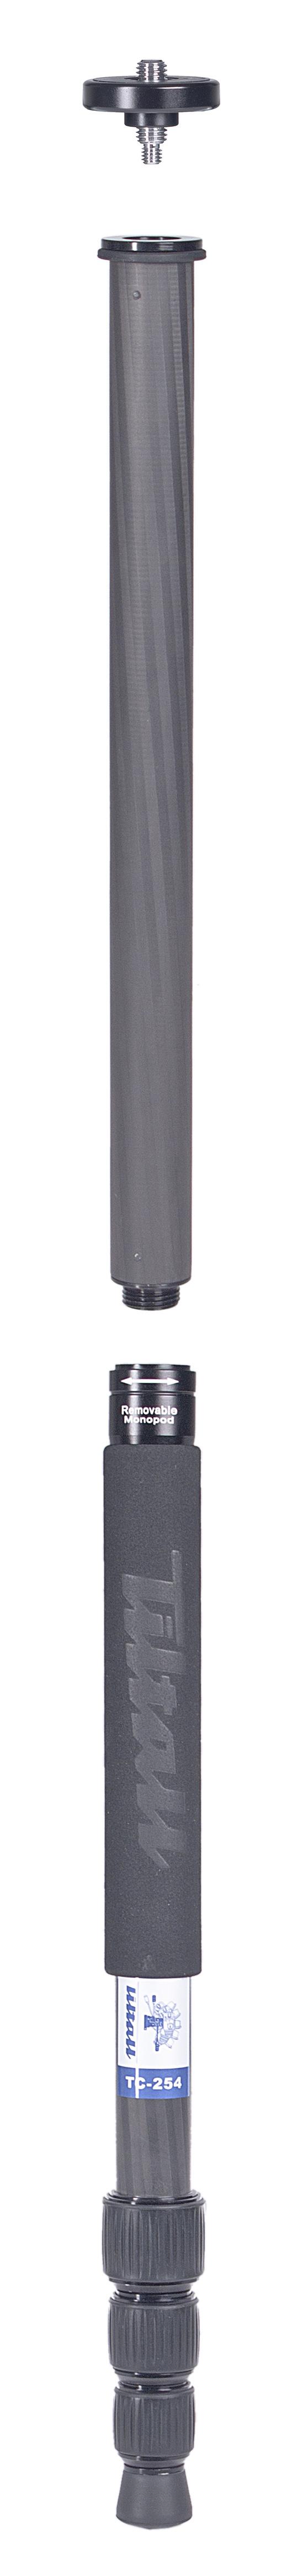 TILTALL Kamerastativ mit integriertem Einbeinstativ TC-254 Carbon